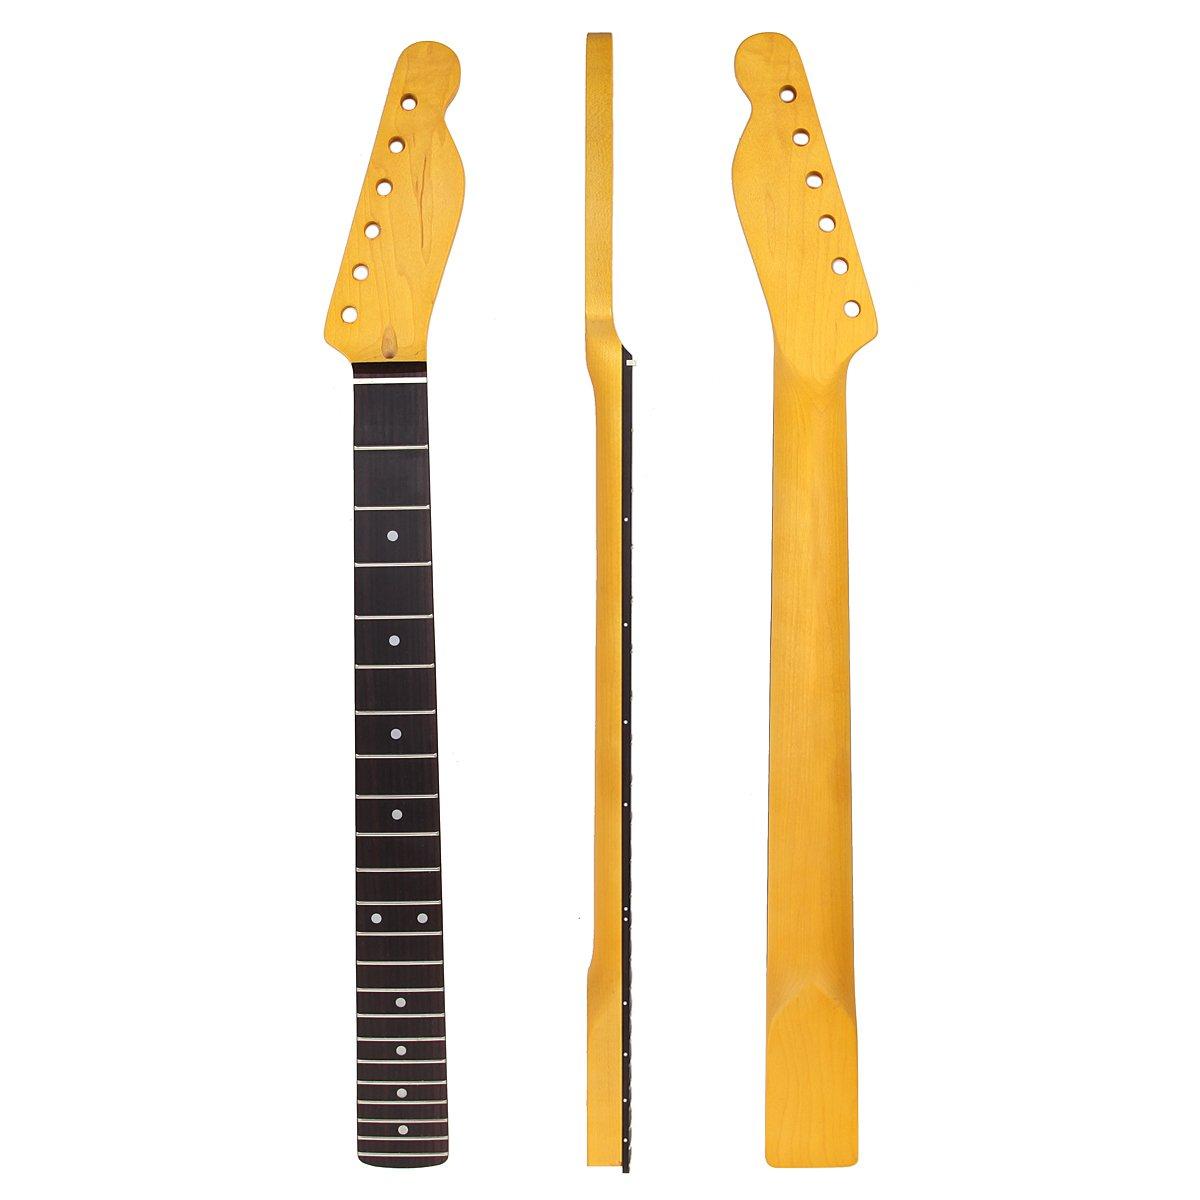 Kmise accessories Electric guitar neck (1)